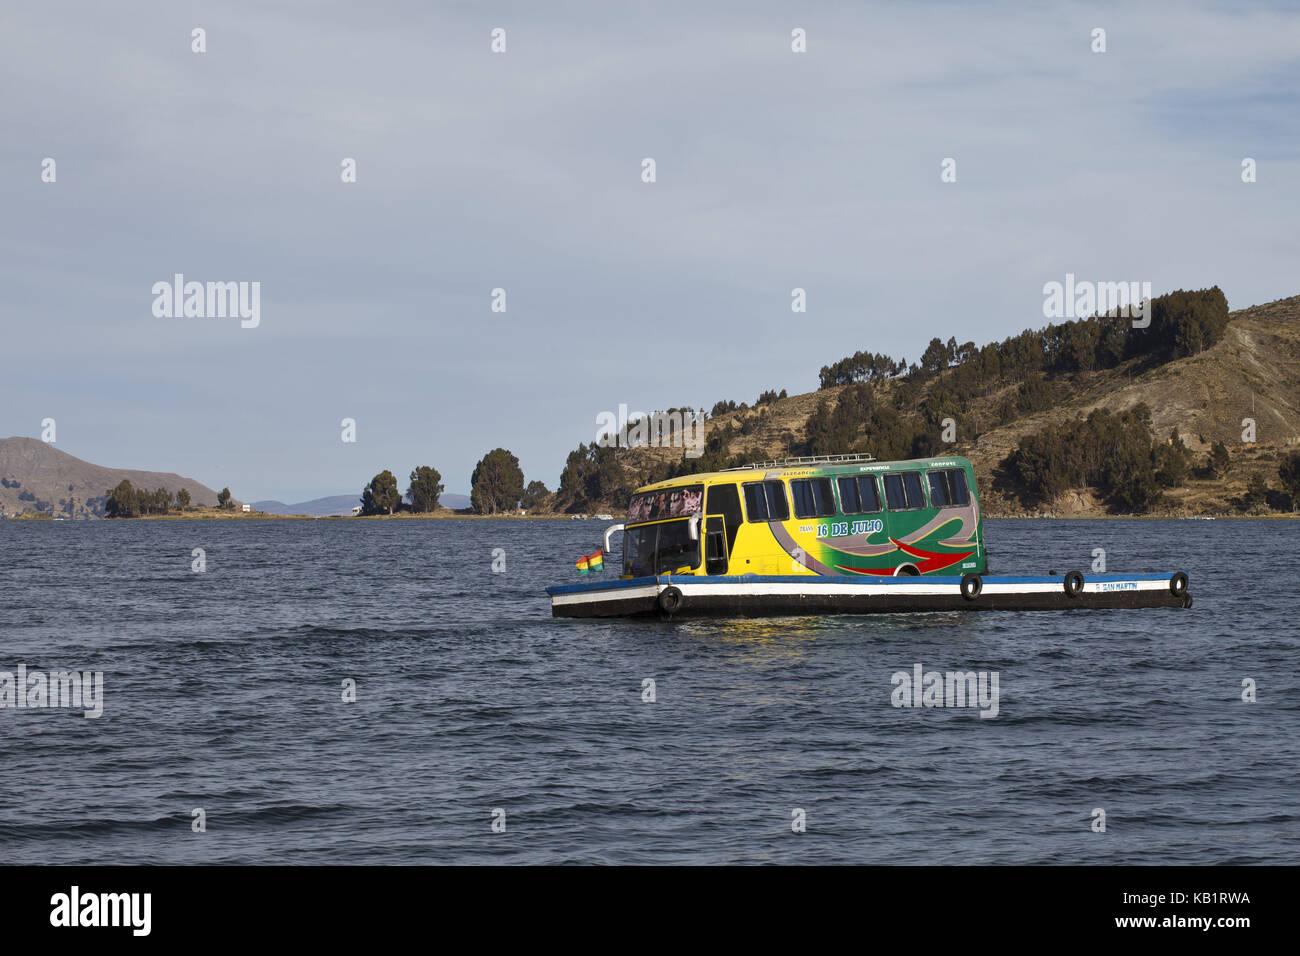 Bolivia, Titicacasee, Copacabana, crossing, - Stock Image